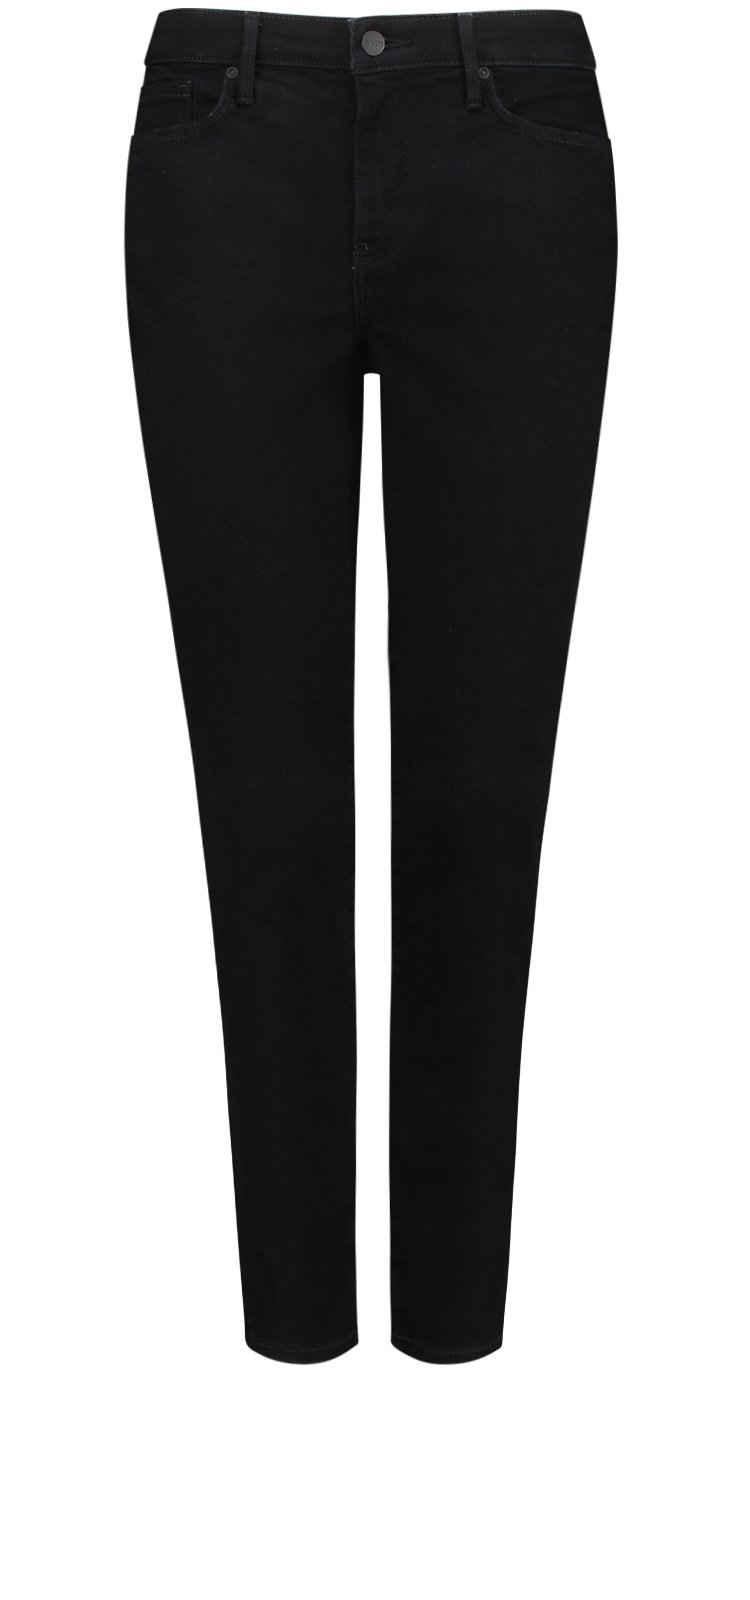 NYDJ Regular-fit-Jeans »in Premium Denim« Alina Legging Ankle